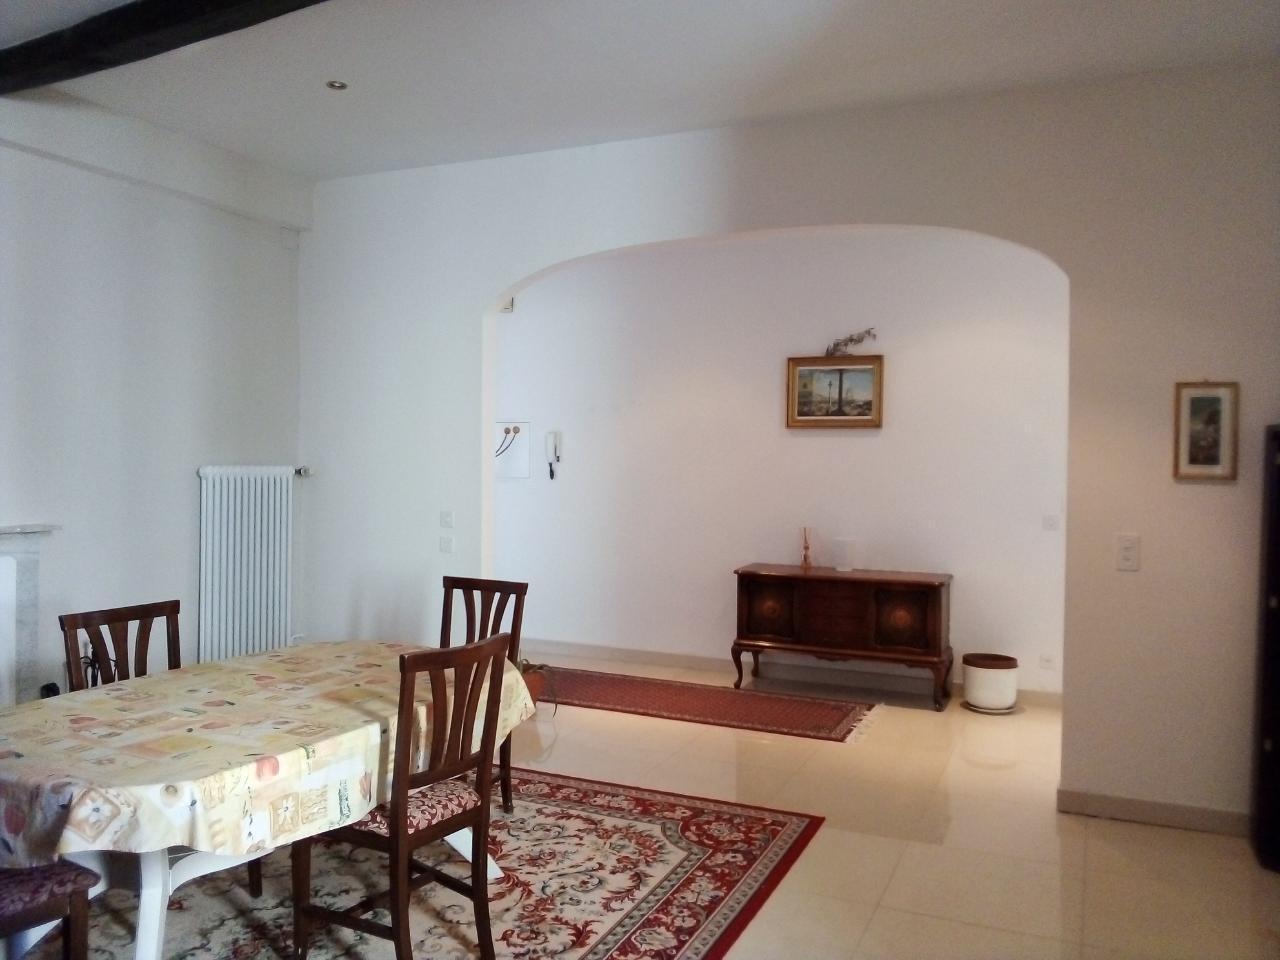 Appartement de vacances Grosszügige Wohnung im historischen Tessinerhaus (2617724), Sessa, Lac de Lugano (CH), Tessin, Suisse, image 3